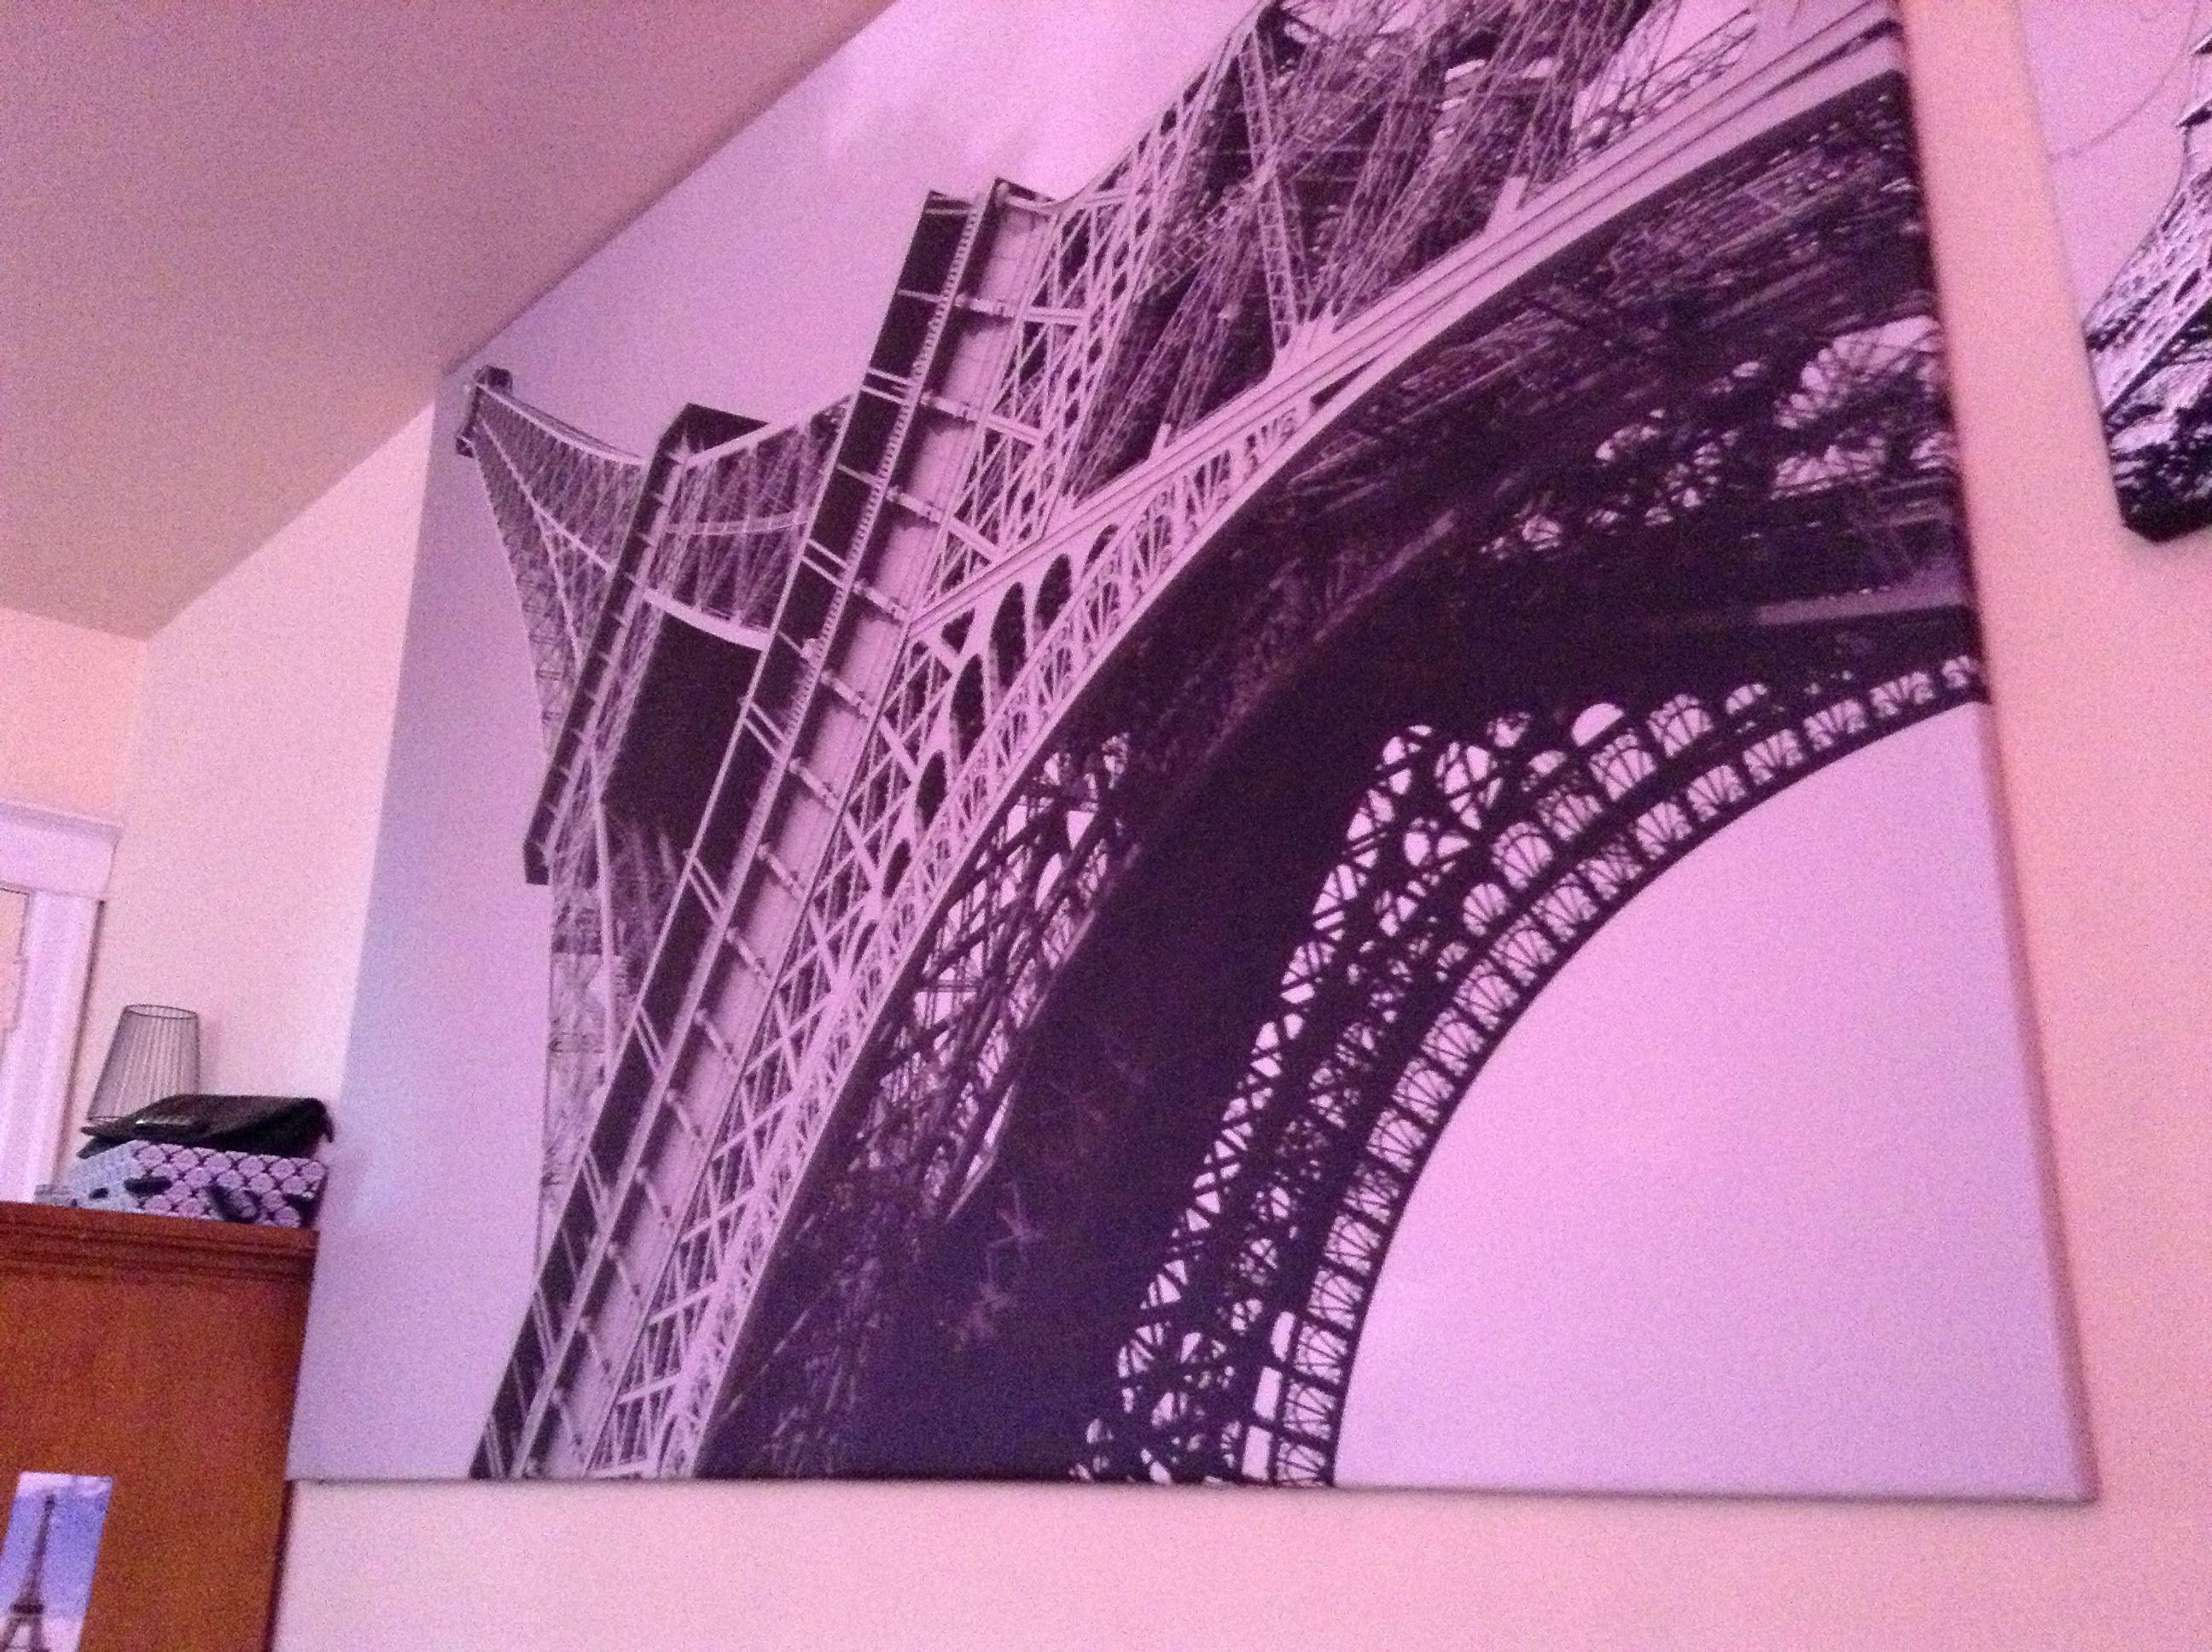 My rooms decor frame, lovely Paris